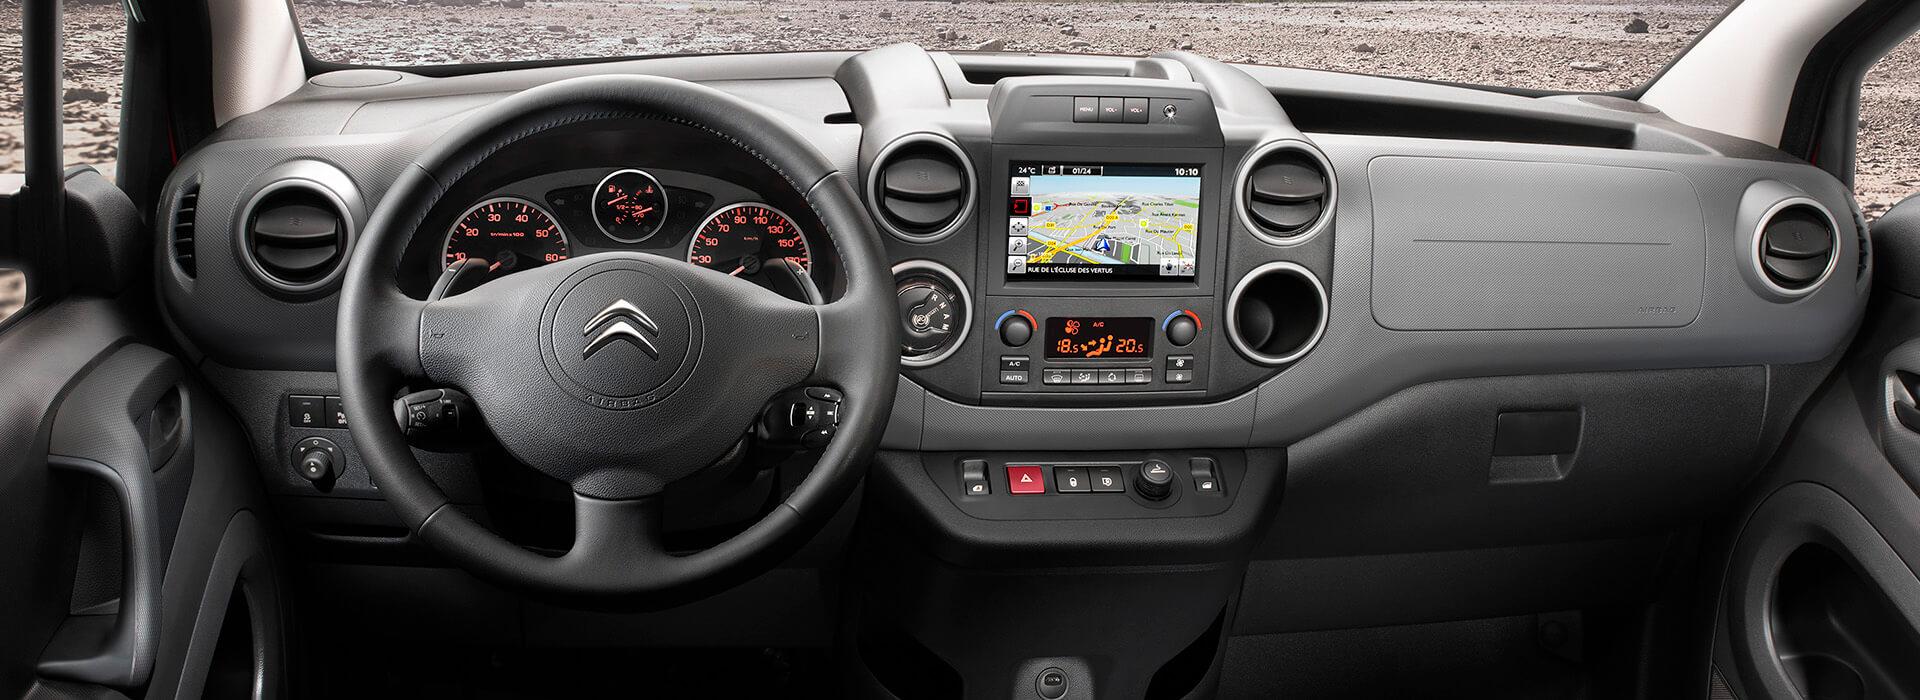 Citroën Berlingo Interieur